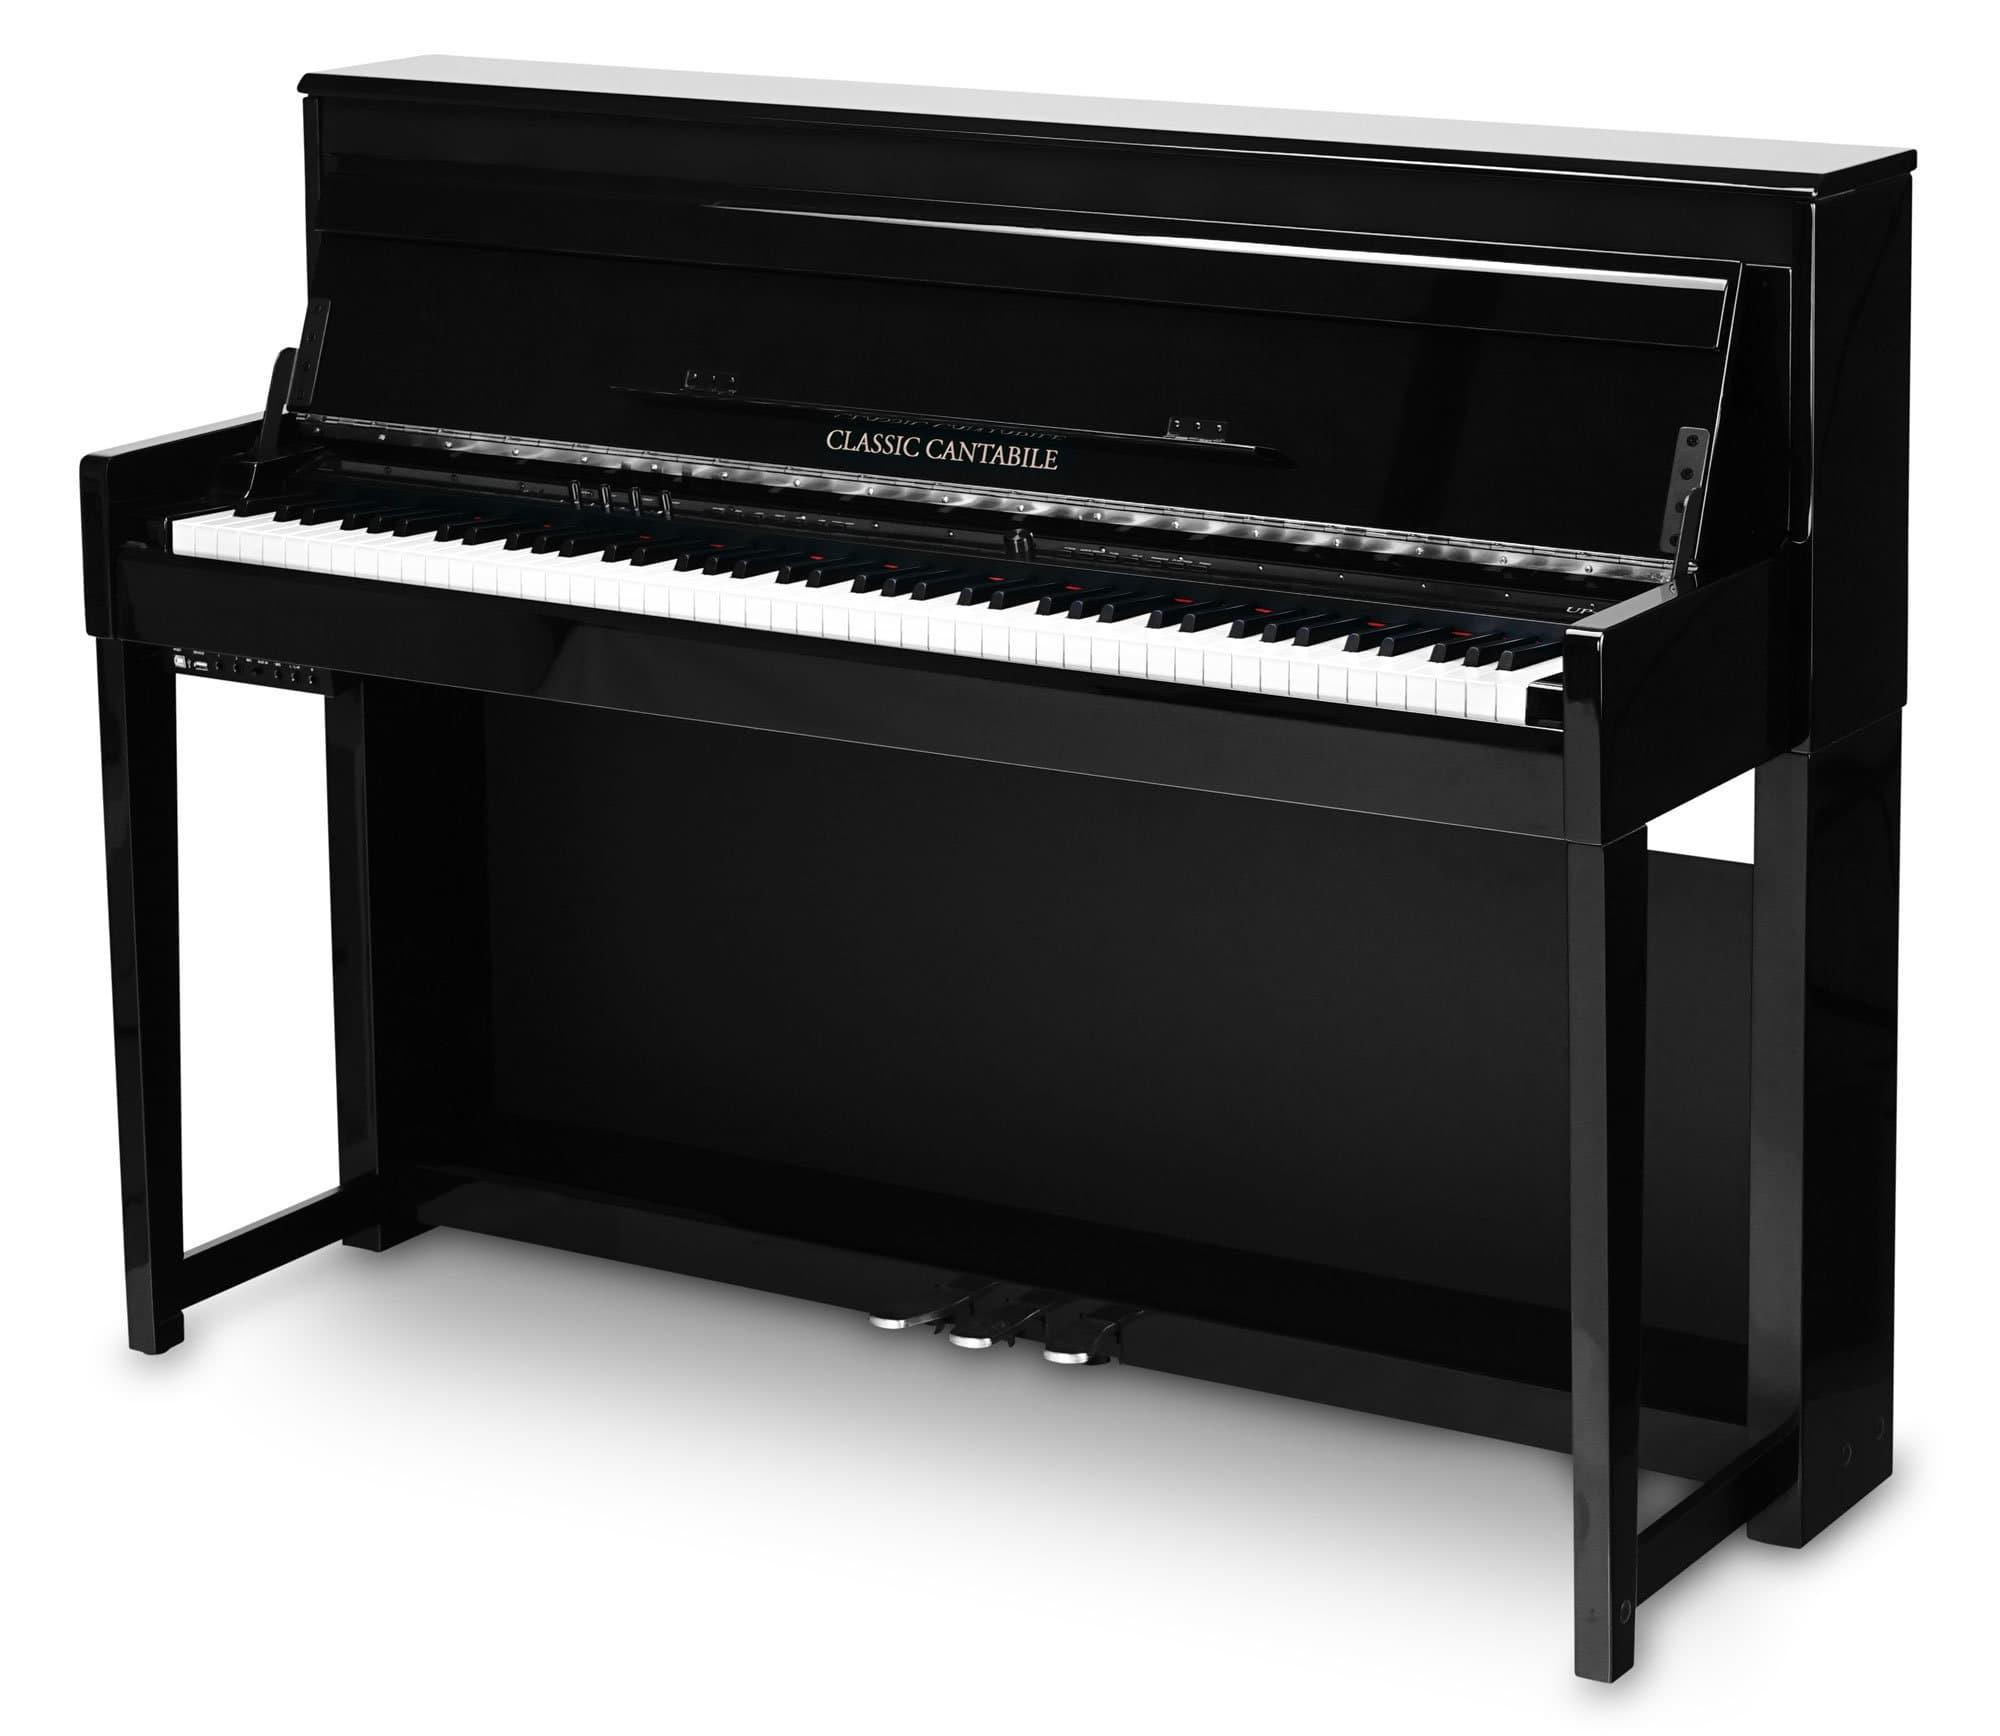 Digitalpianos - Classic Cantabile UP 1 SH Upright E Piano Schwarz hochglanz - Onlineshop Musikhaus Kirstein